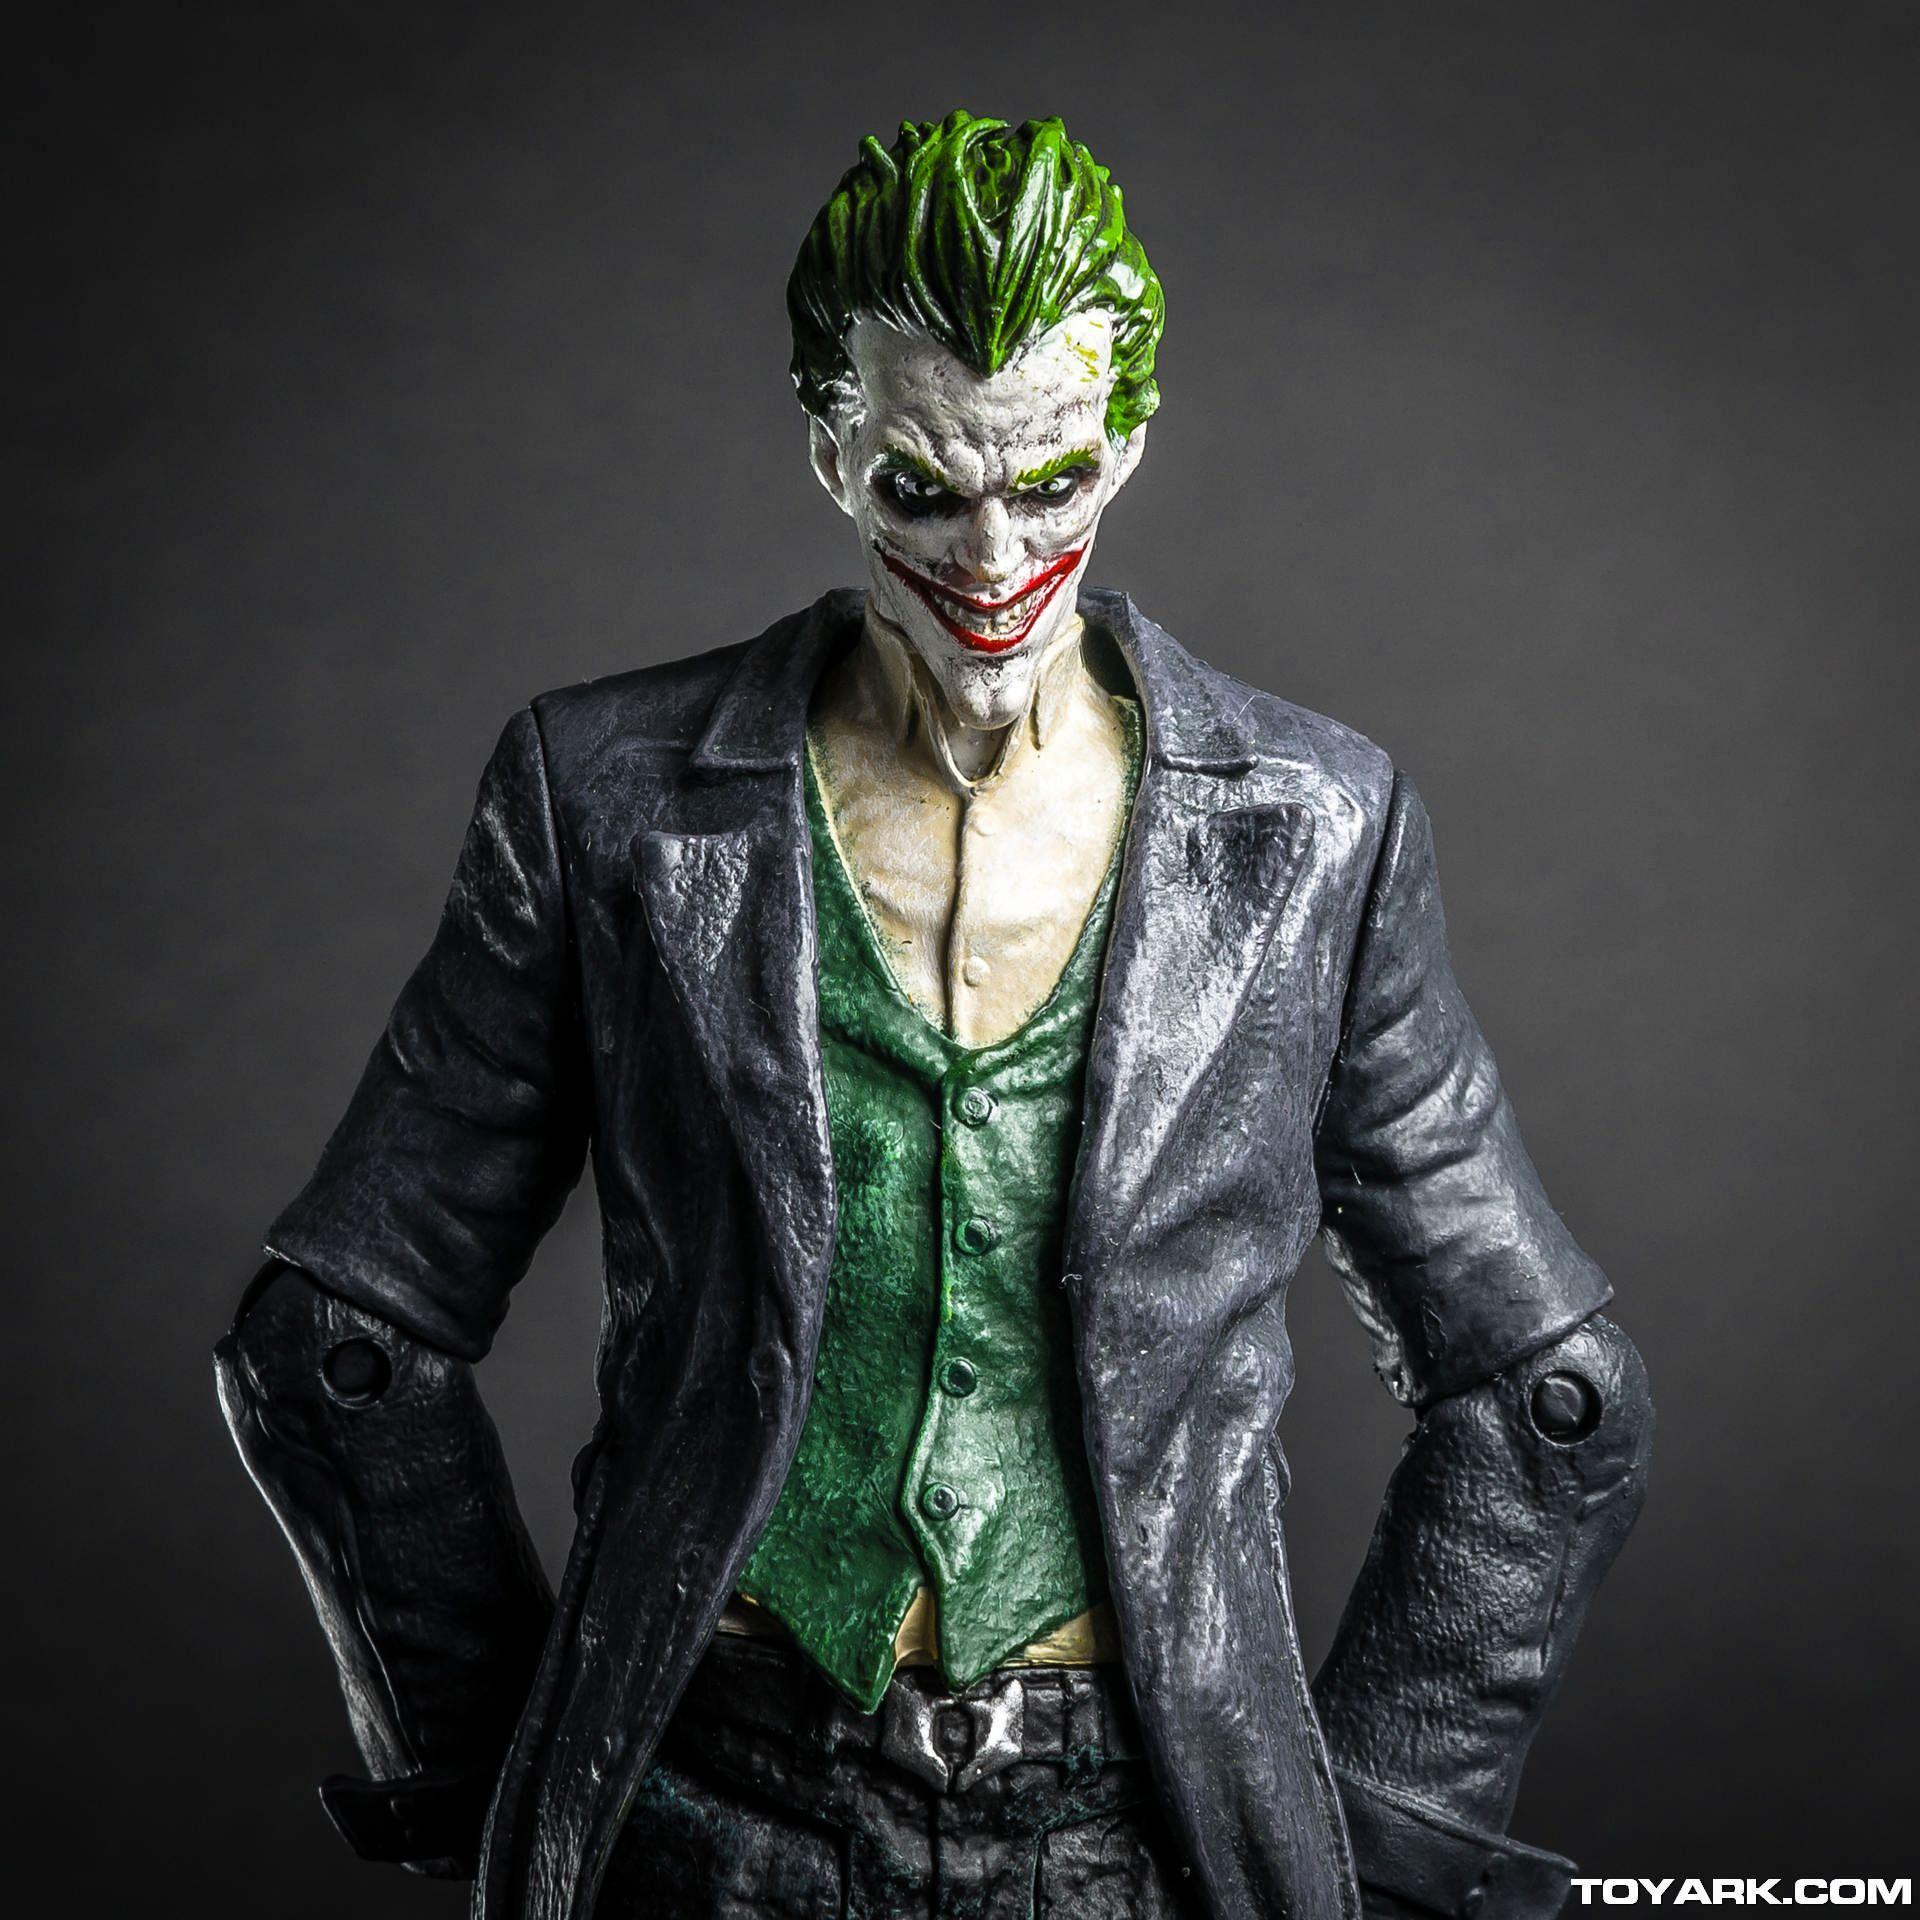 Joker Batman Arkham Origins Wallpapers HD - Wallpaper Cave